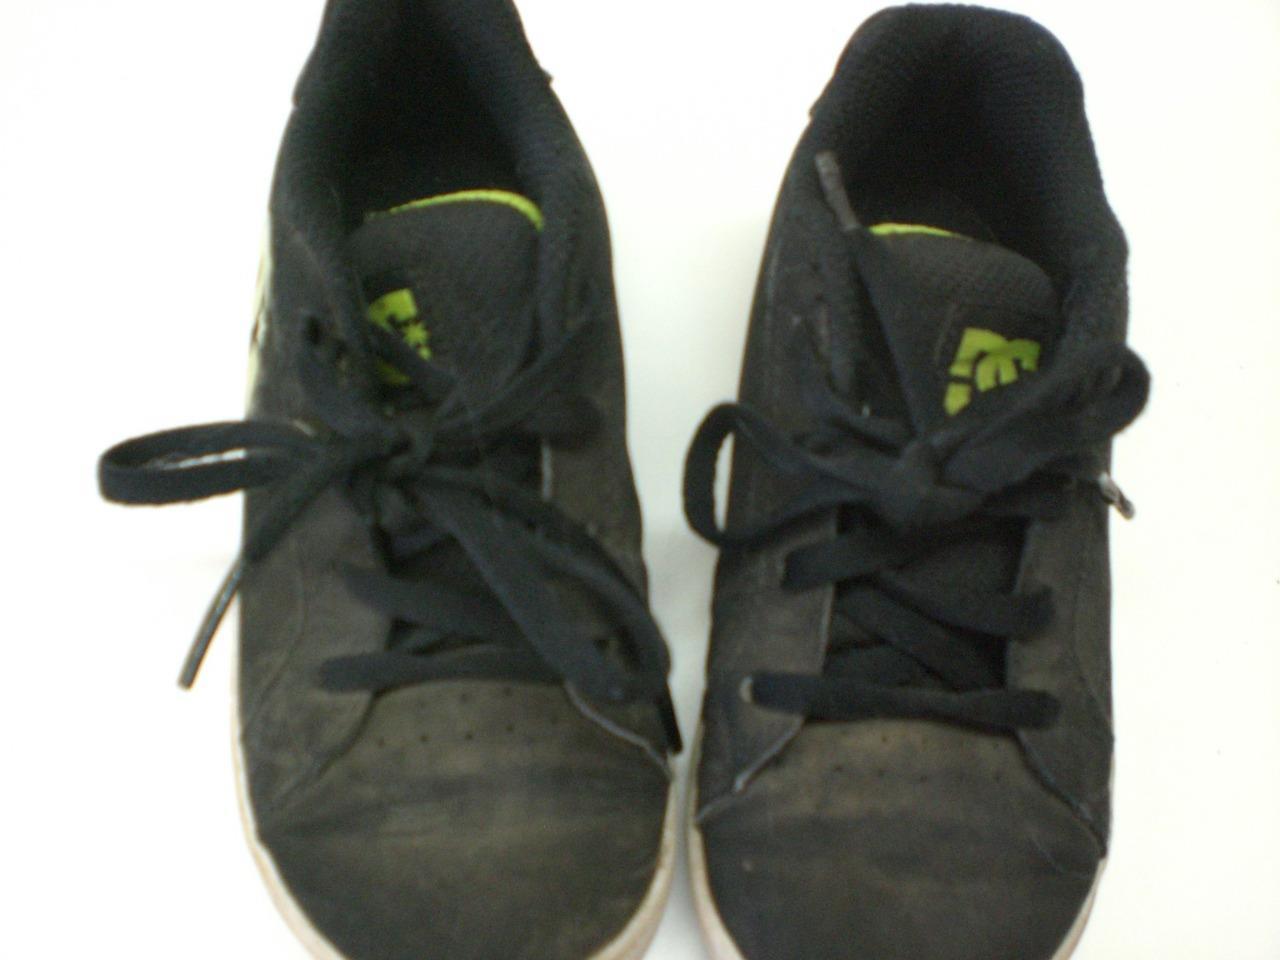 Boys DC SHOES Black/Lime Green Logo SKATE SHOES Lace Up sz 10 Kids